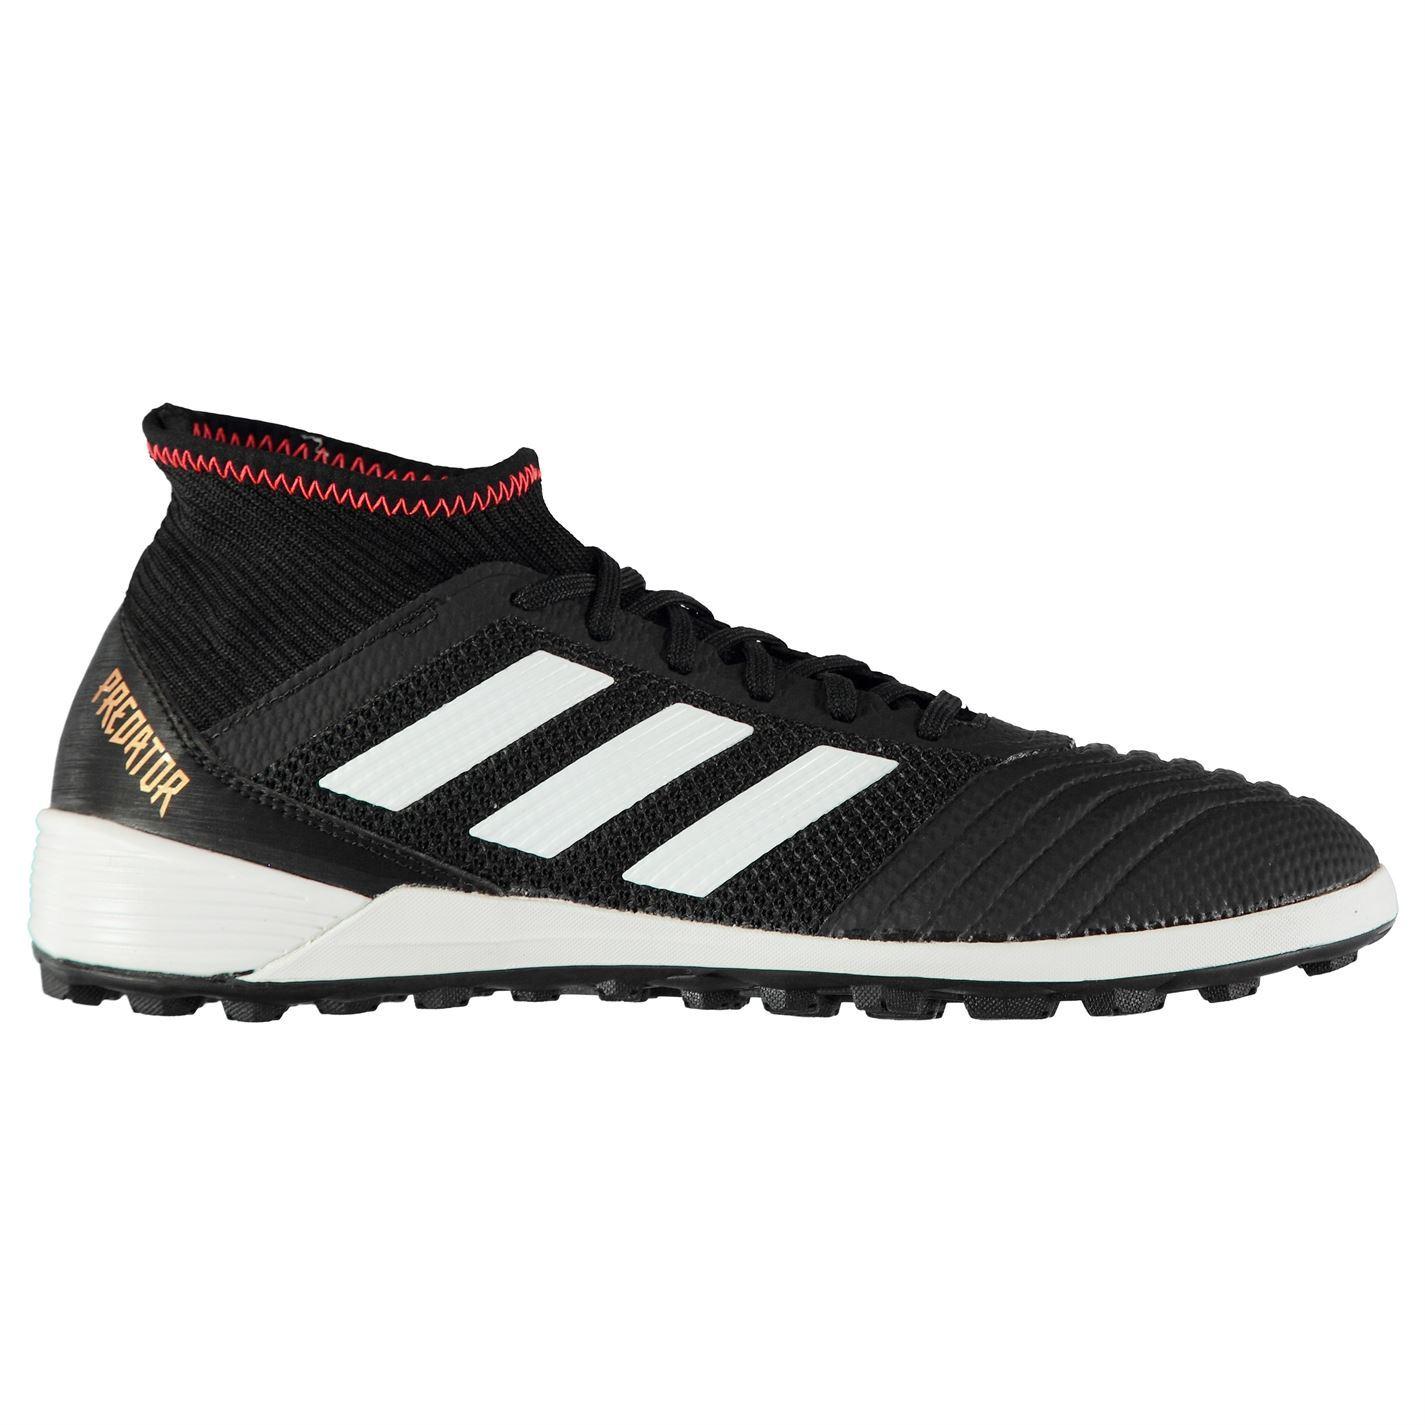 43e4fc99c ... adidas Predator Tango 18.3 Astro Turf Football Trainers Mens Soccer  Shoes Black ...